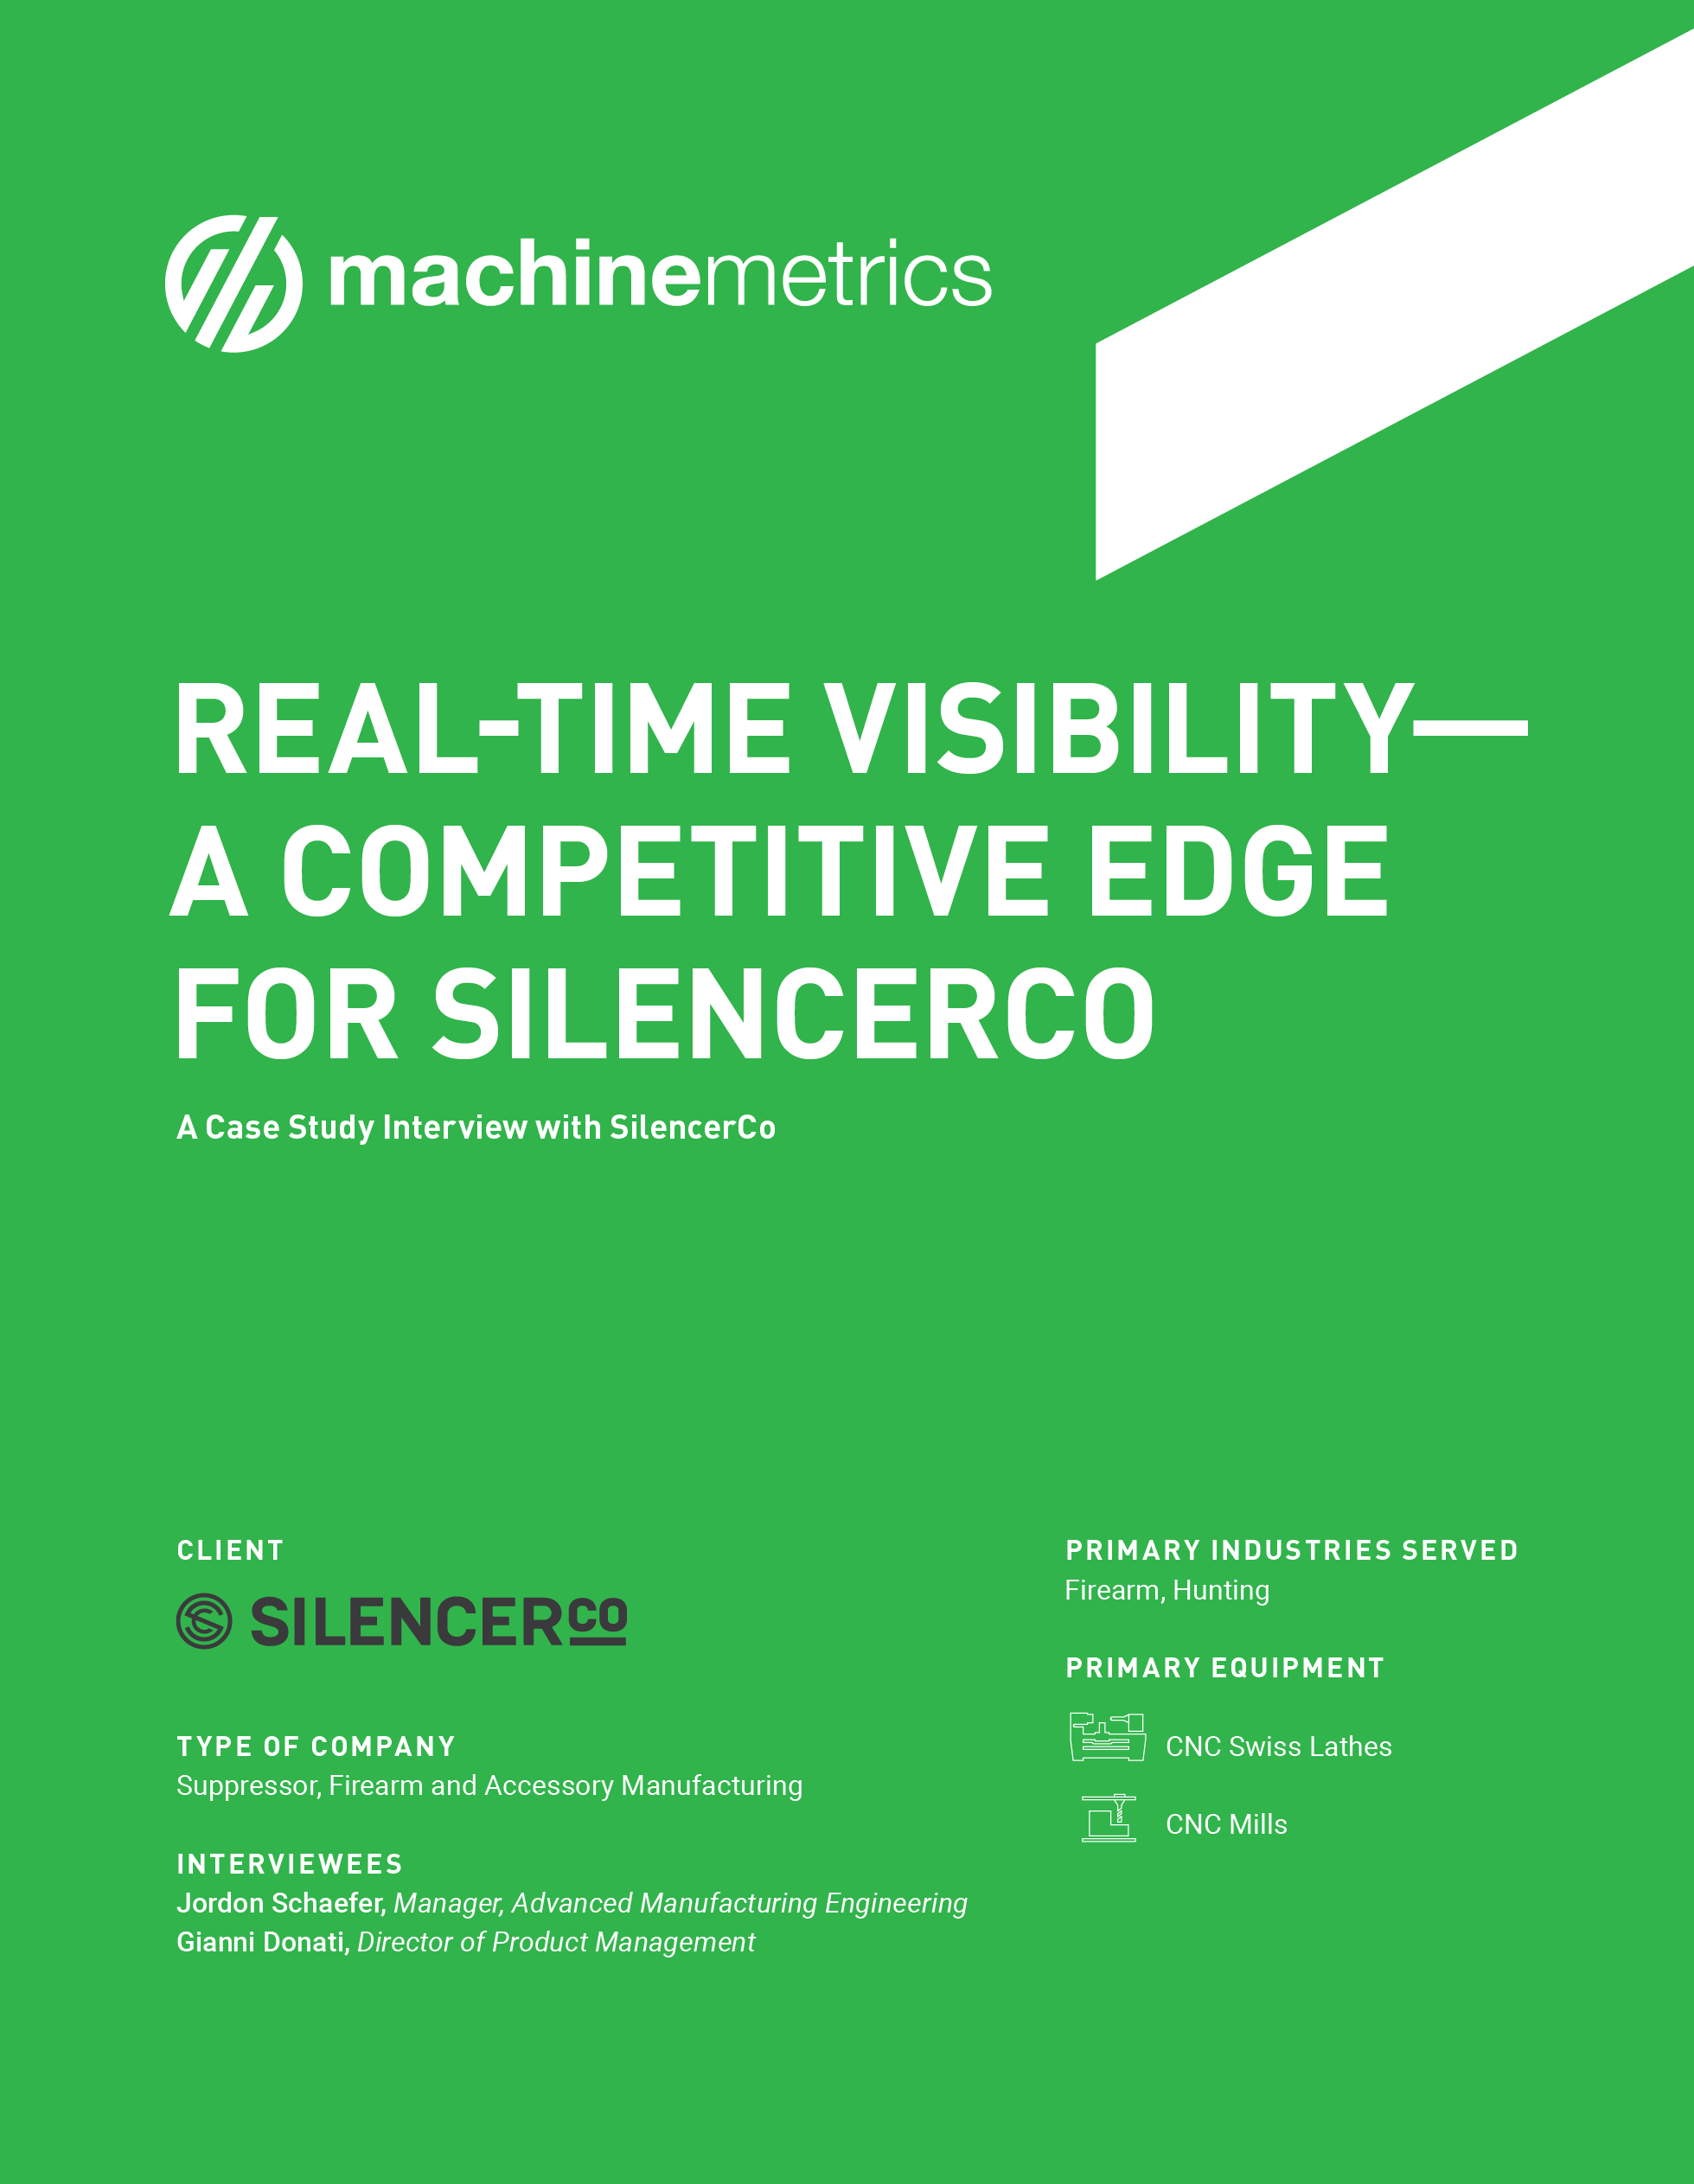 silencerco case study cover-13-01